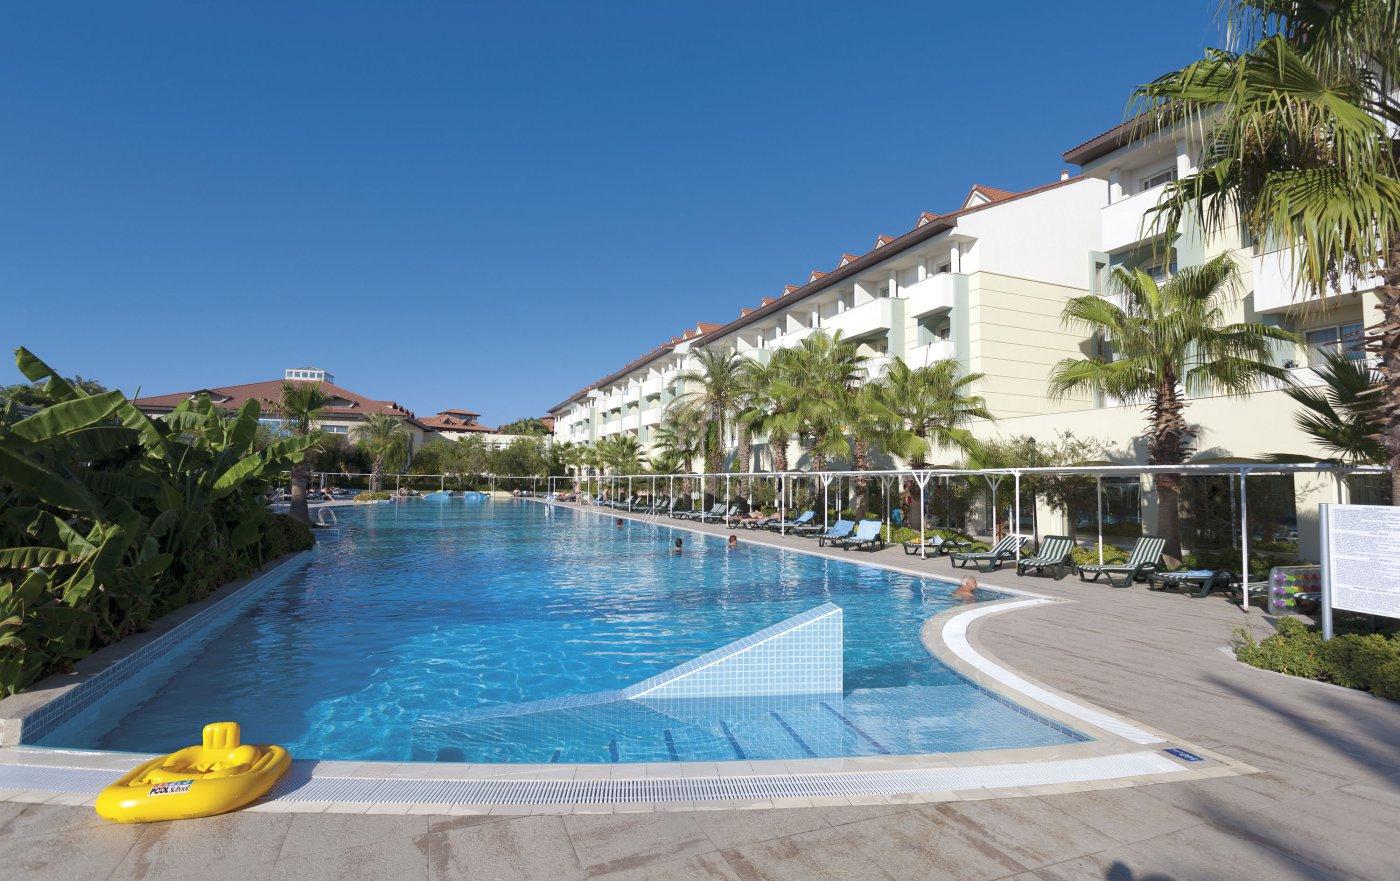 Фото отеля Sural Resort 5* (Сурал Резорт 5*)